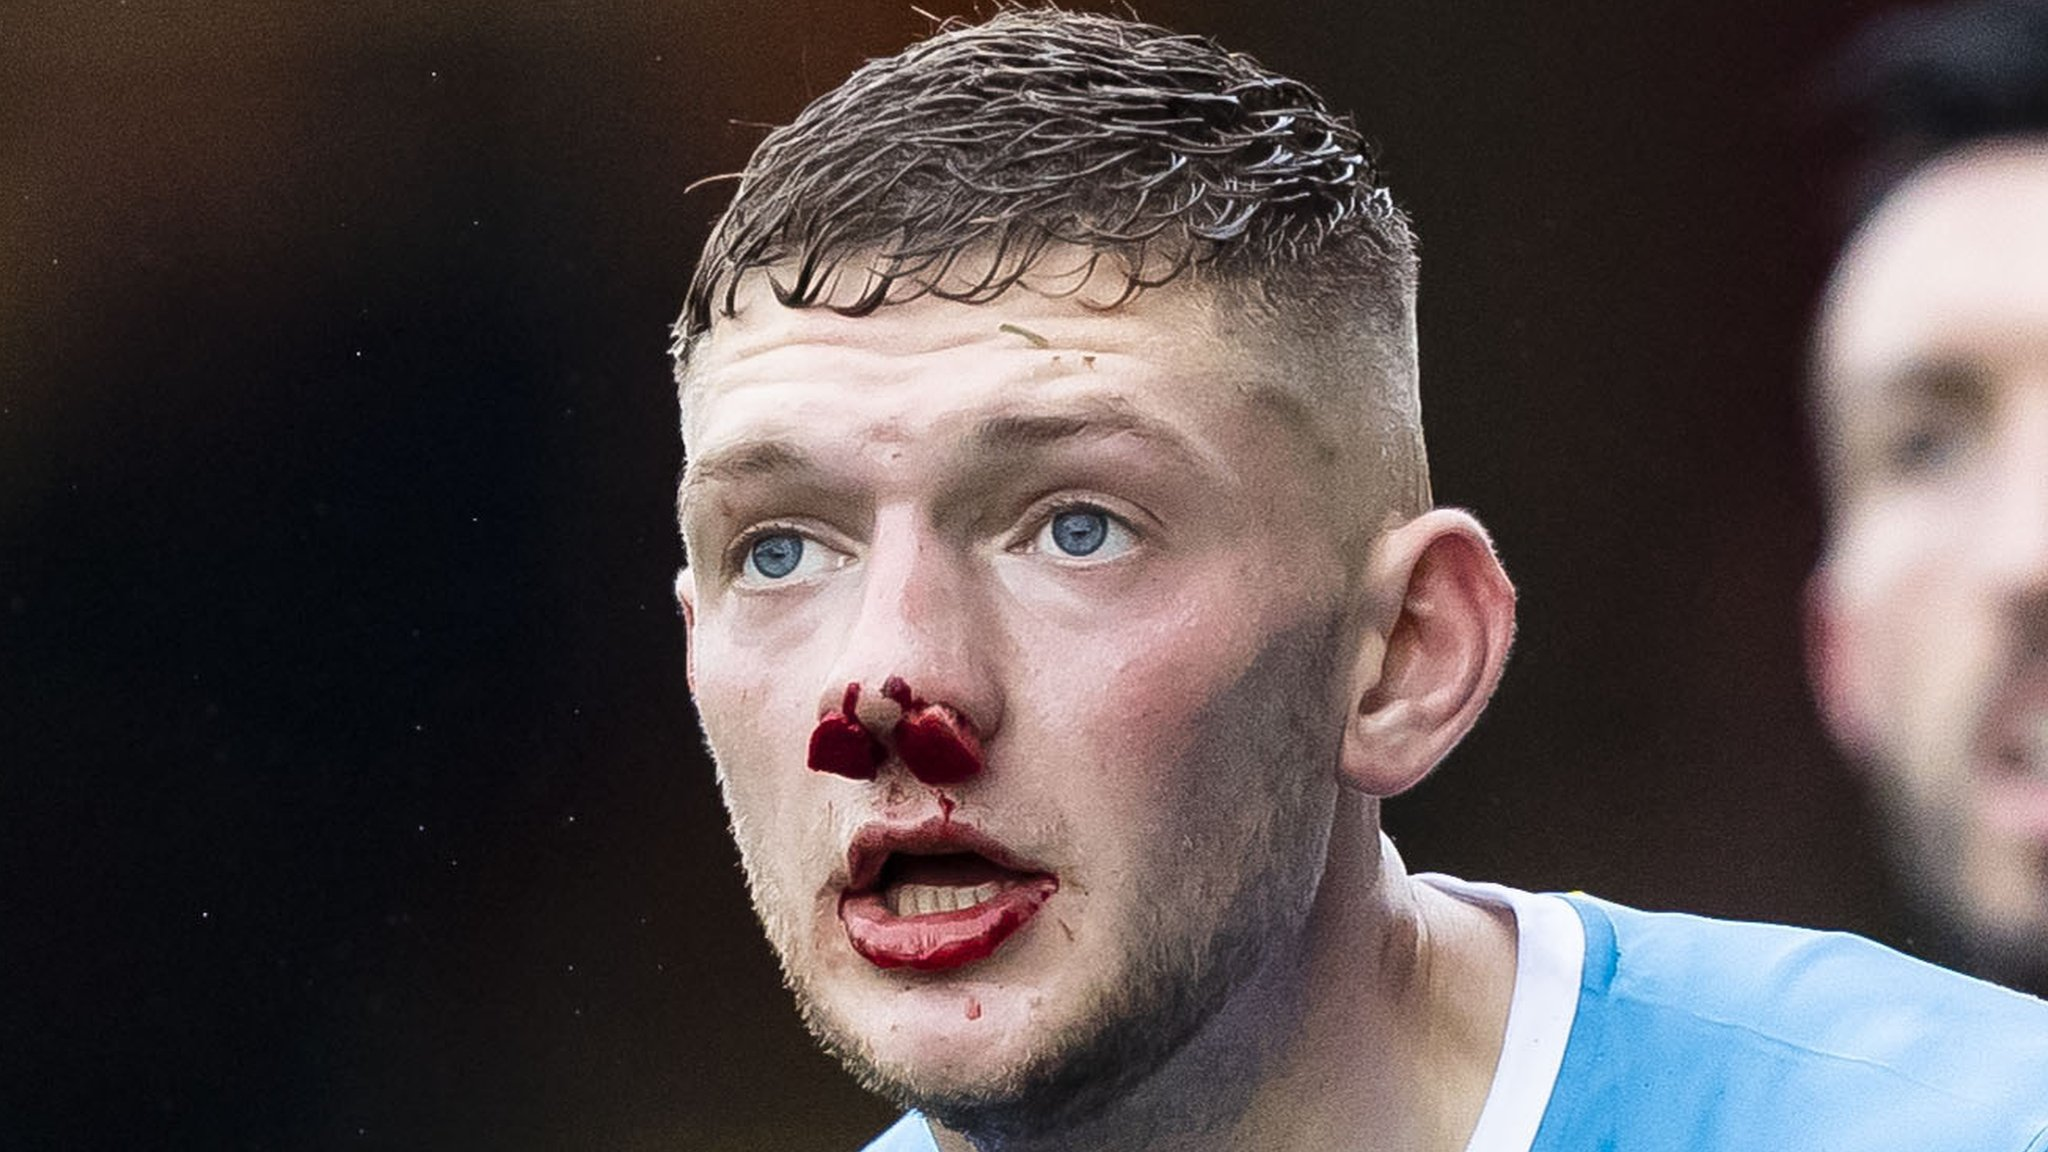 Profligate Motherwell beaten 1-0 by St Johnstone